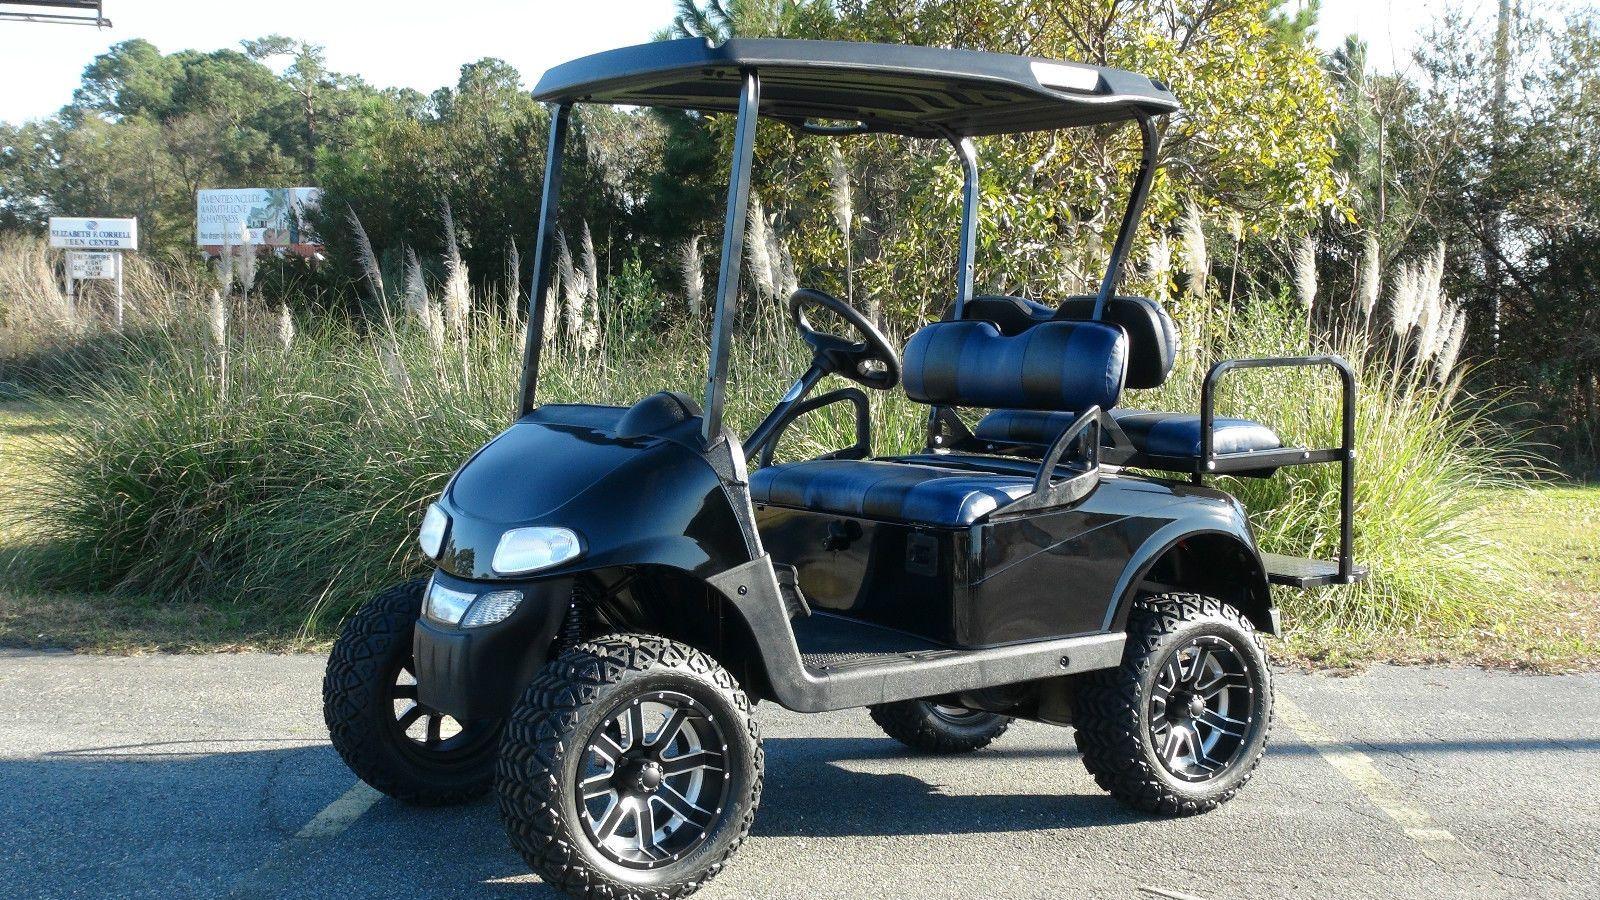 EZGO RXV GAS GOLF Cart/ Refurbished Custom / 4 Penger / Lifted ... Gas Powered Ez Go Golf Carts Html on